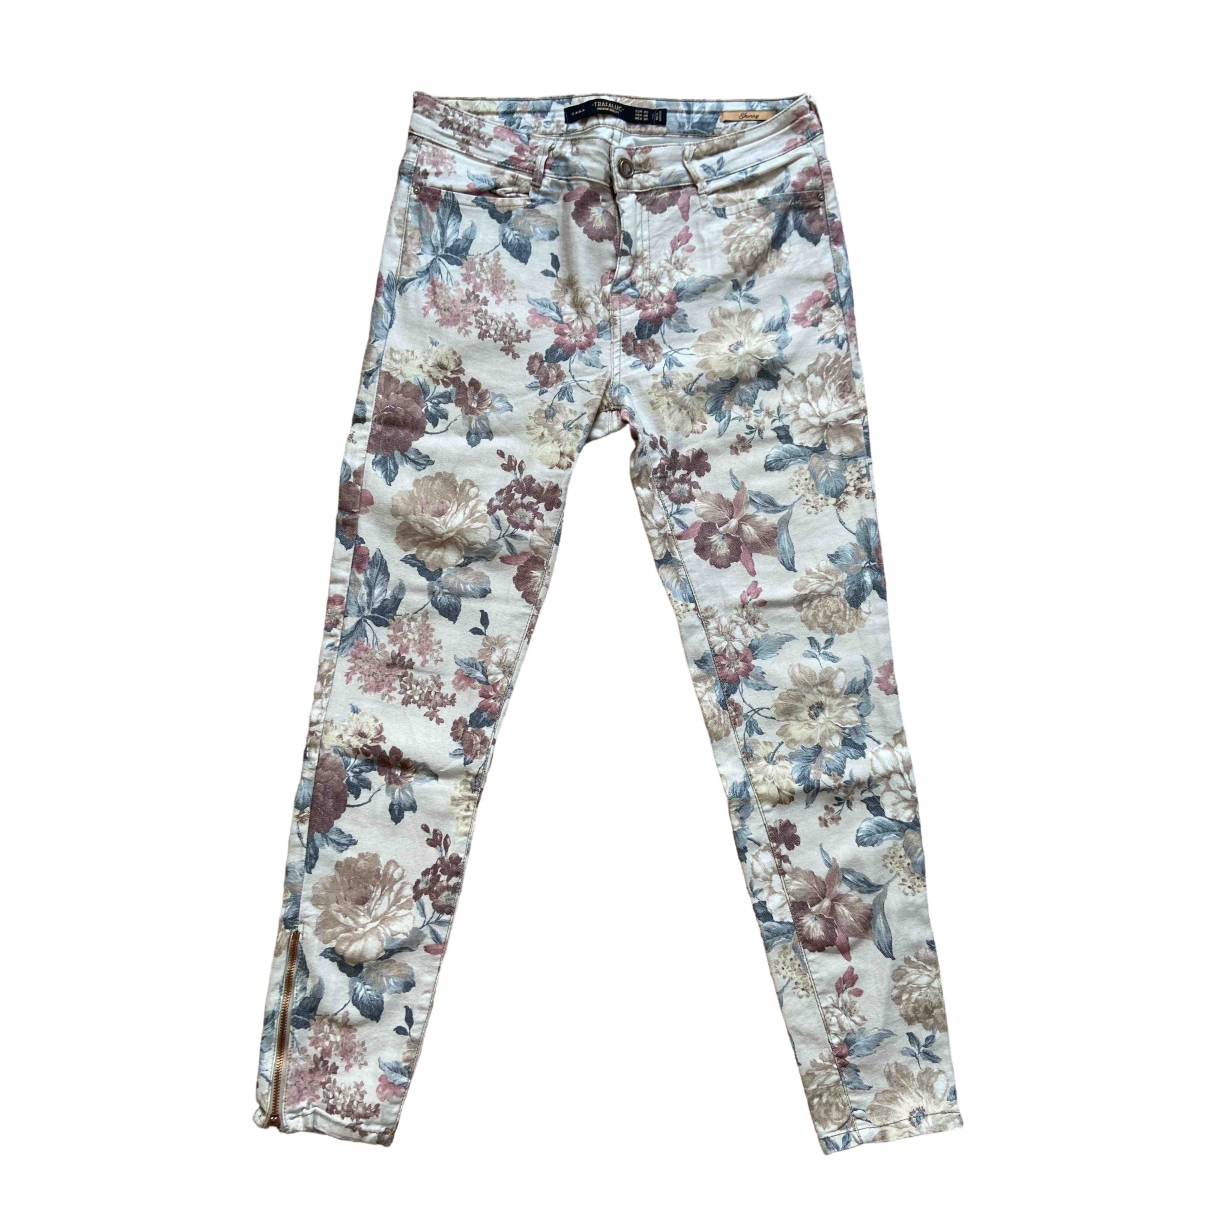 Zara \N Beige Cotton - elasthane Jeans for Women 28 US